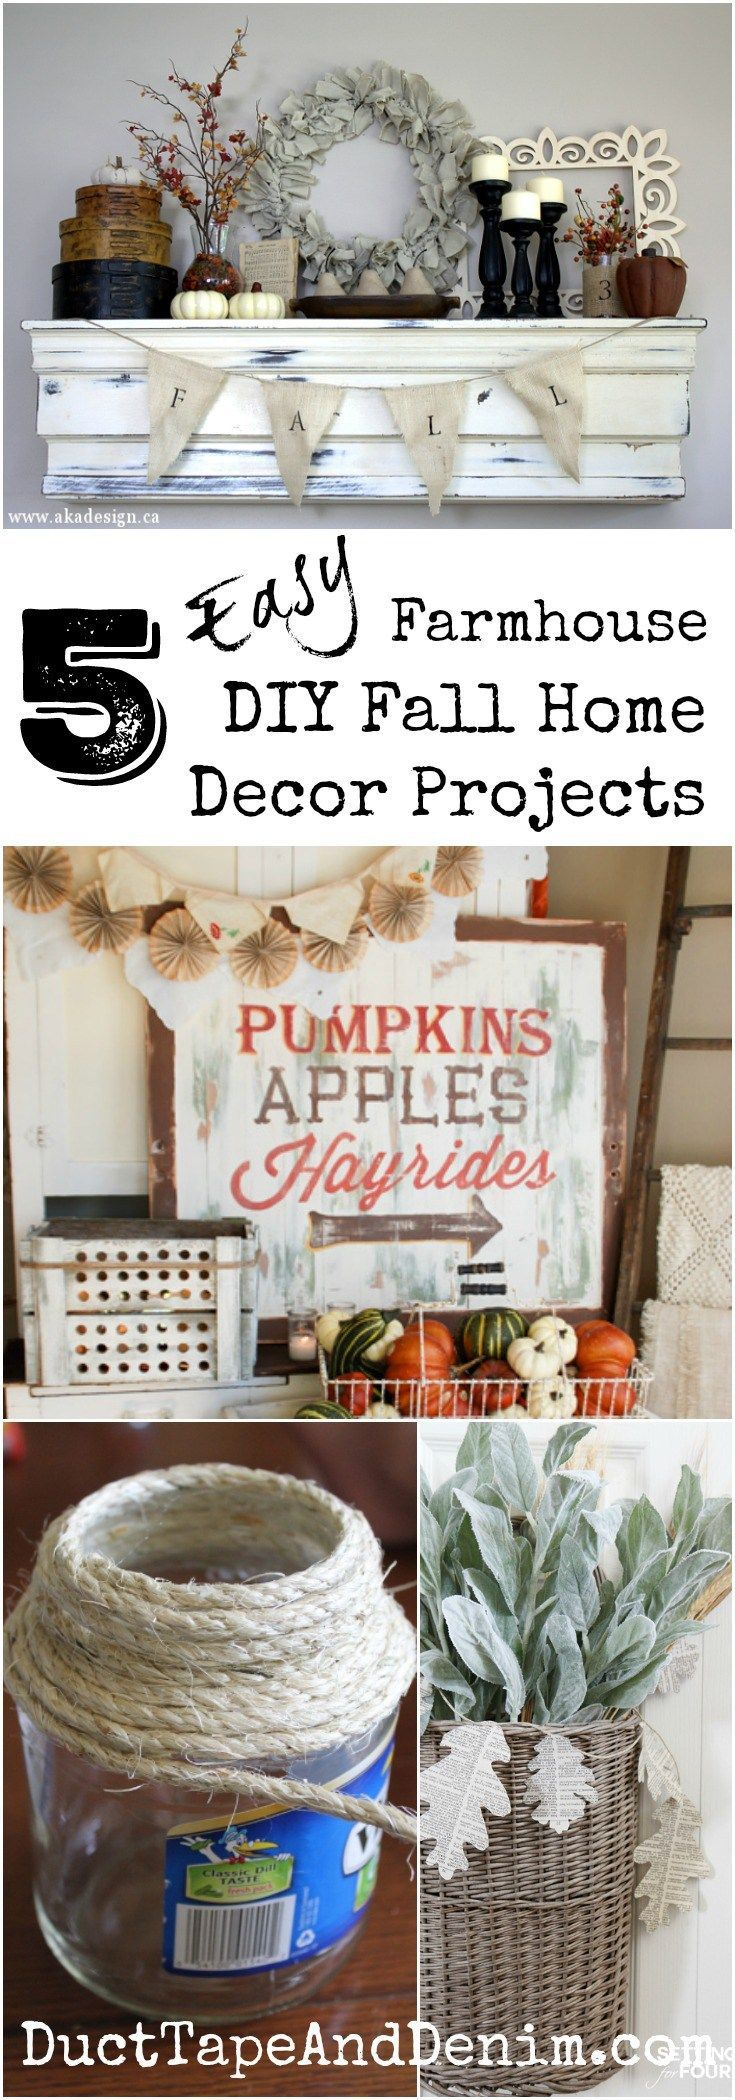 5 Easy Farmhouse DIY Fall Home Decor Projects